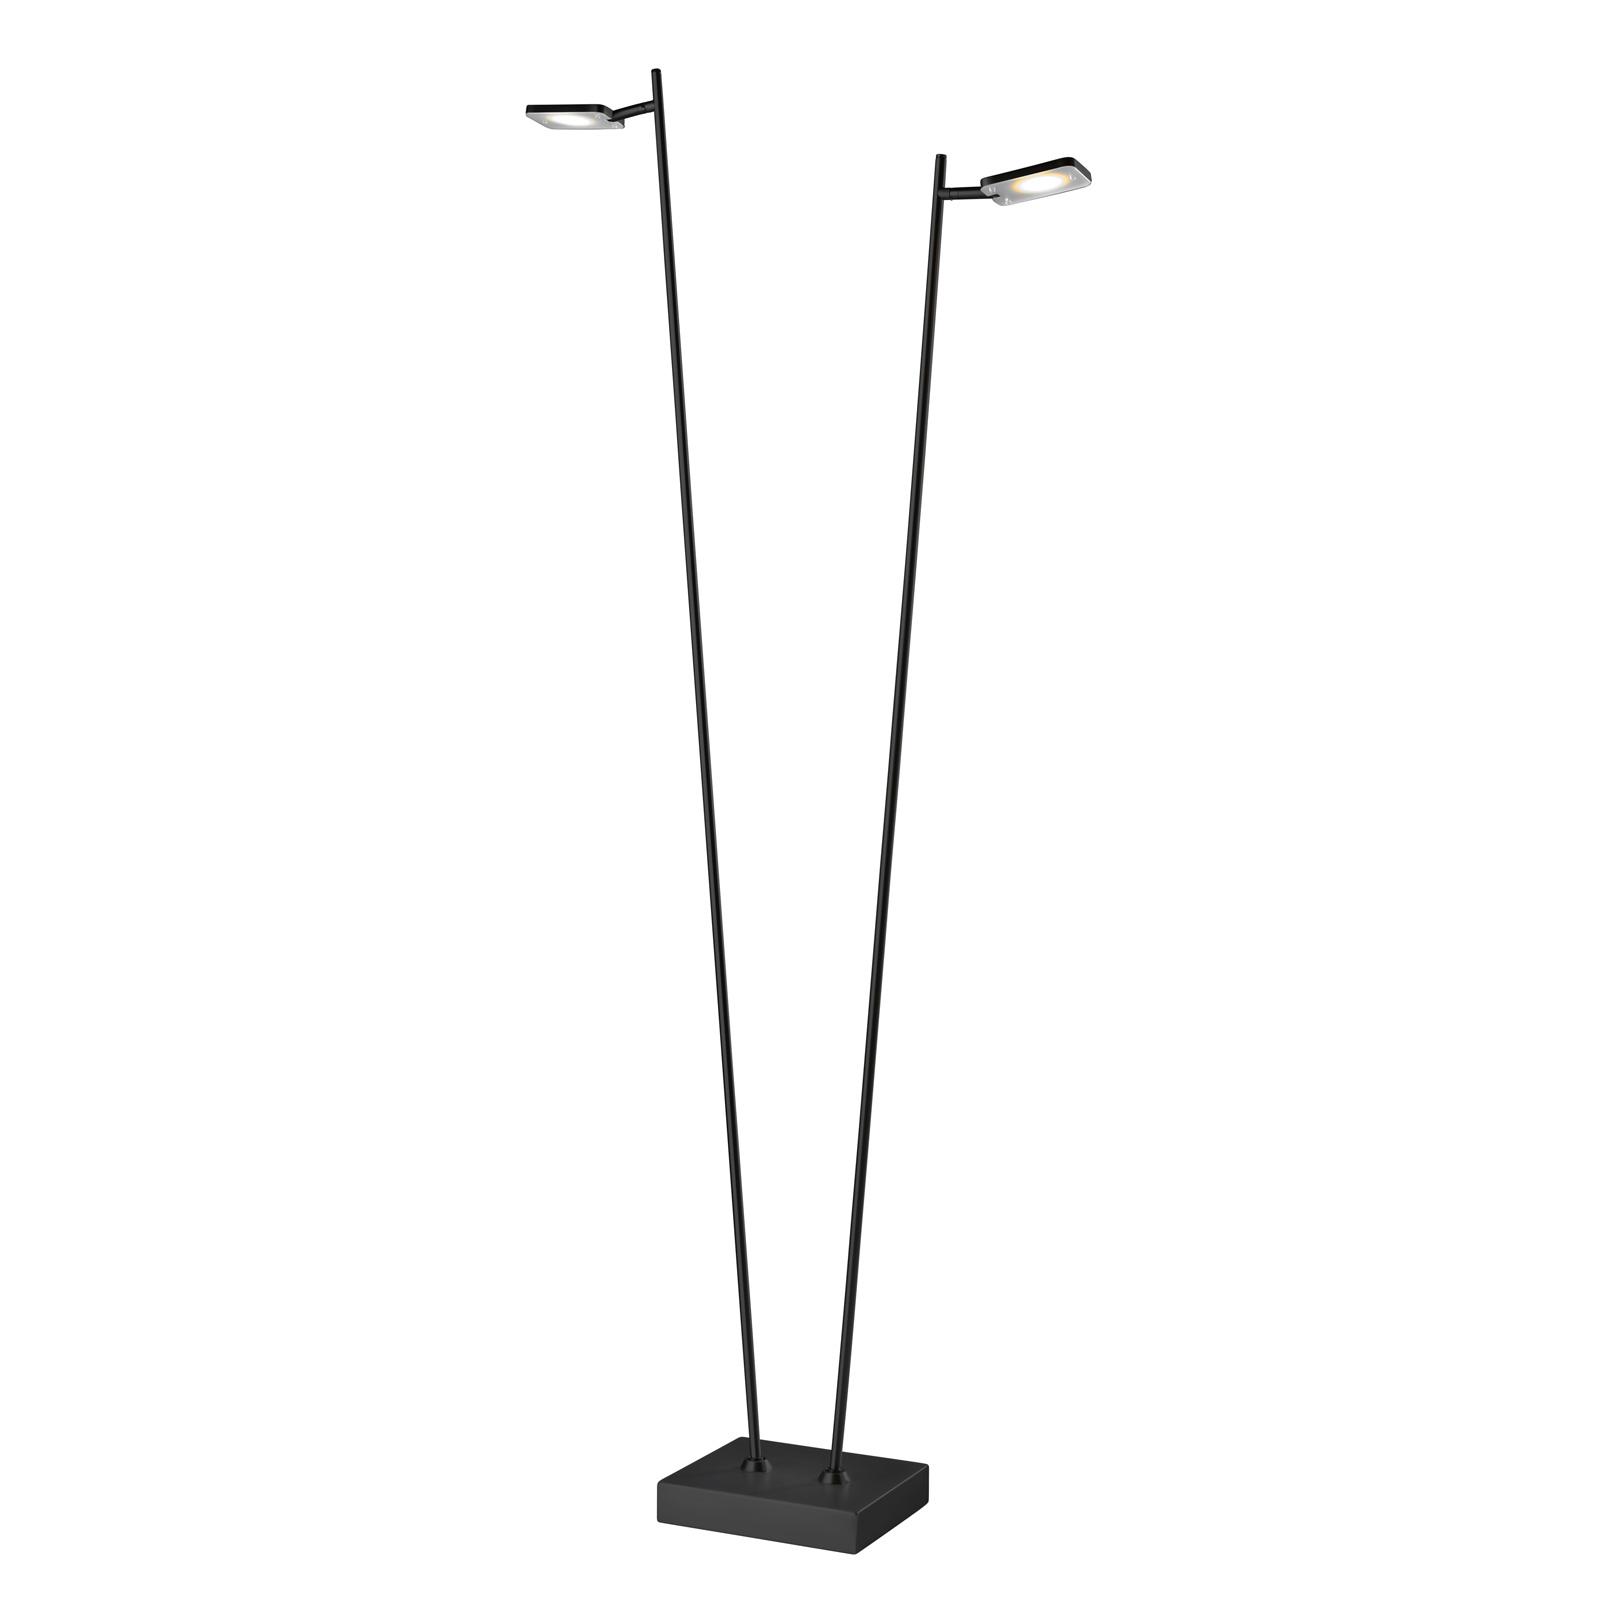 LED-gulvlampe Quad, dimmer, 2 lyskilde, svart